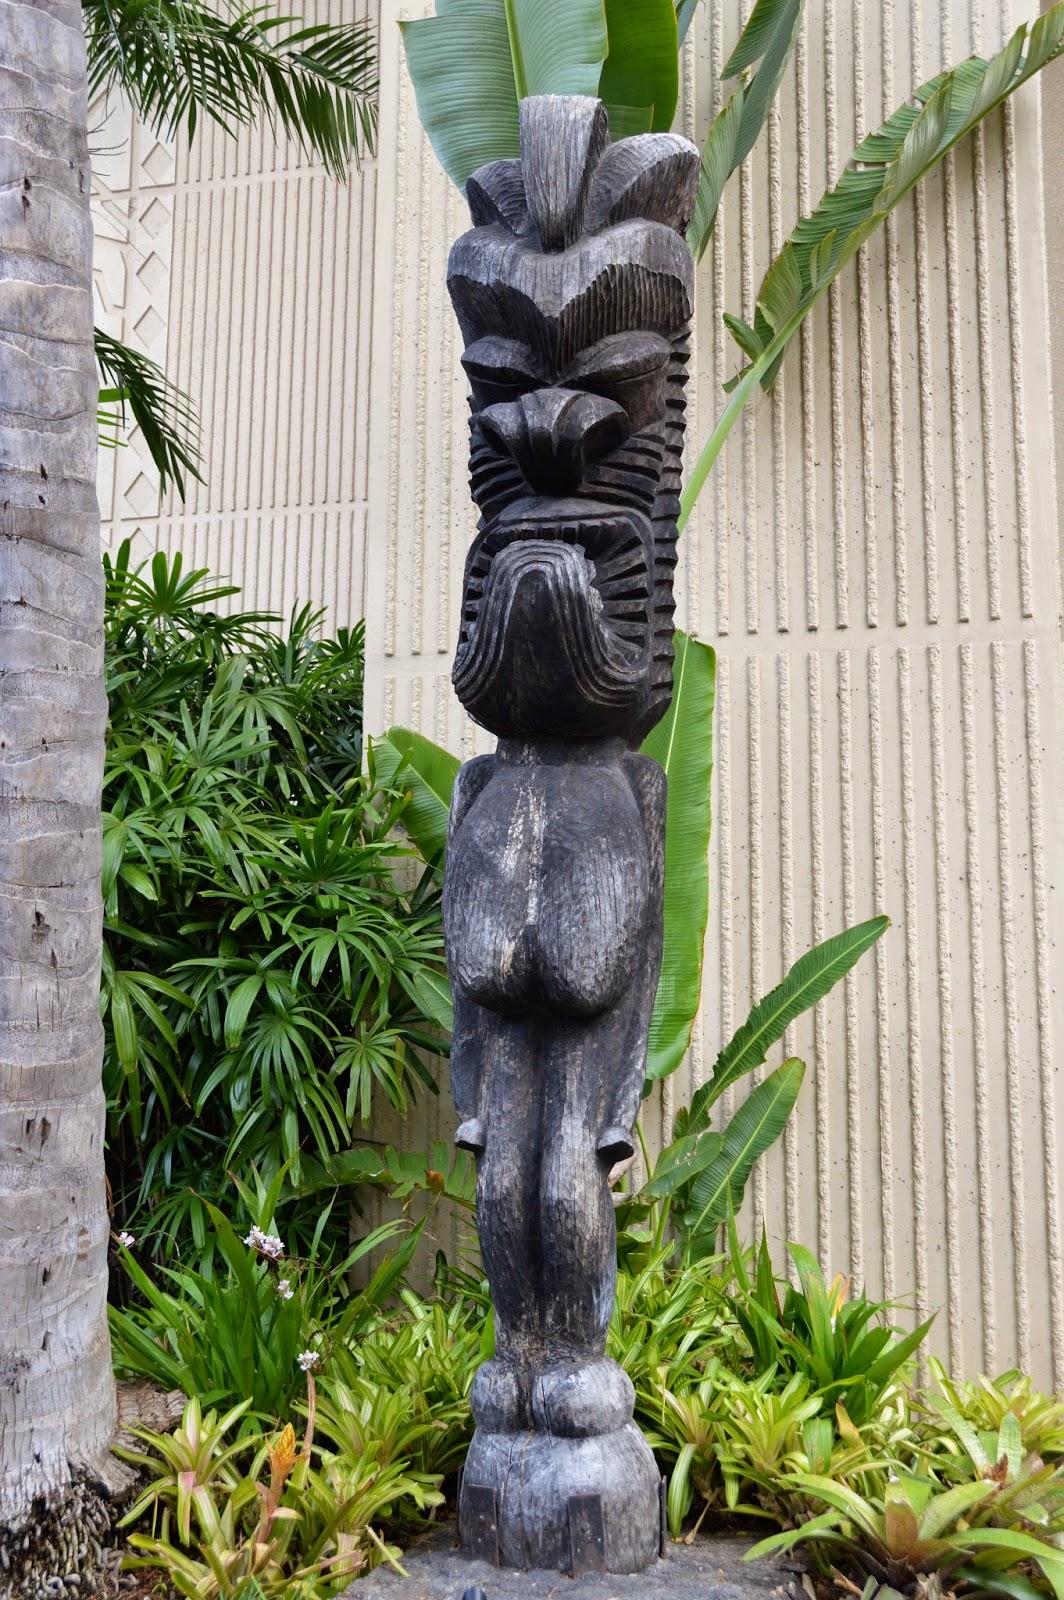 Hawaii Day 5 and 6